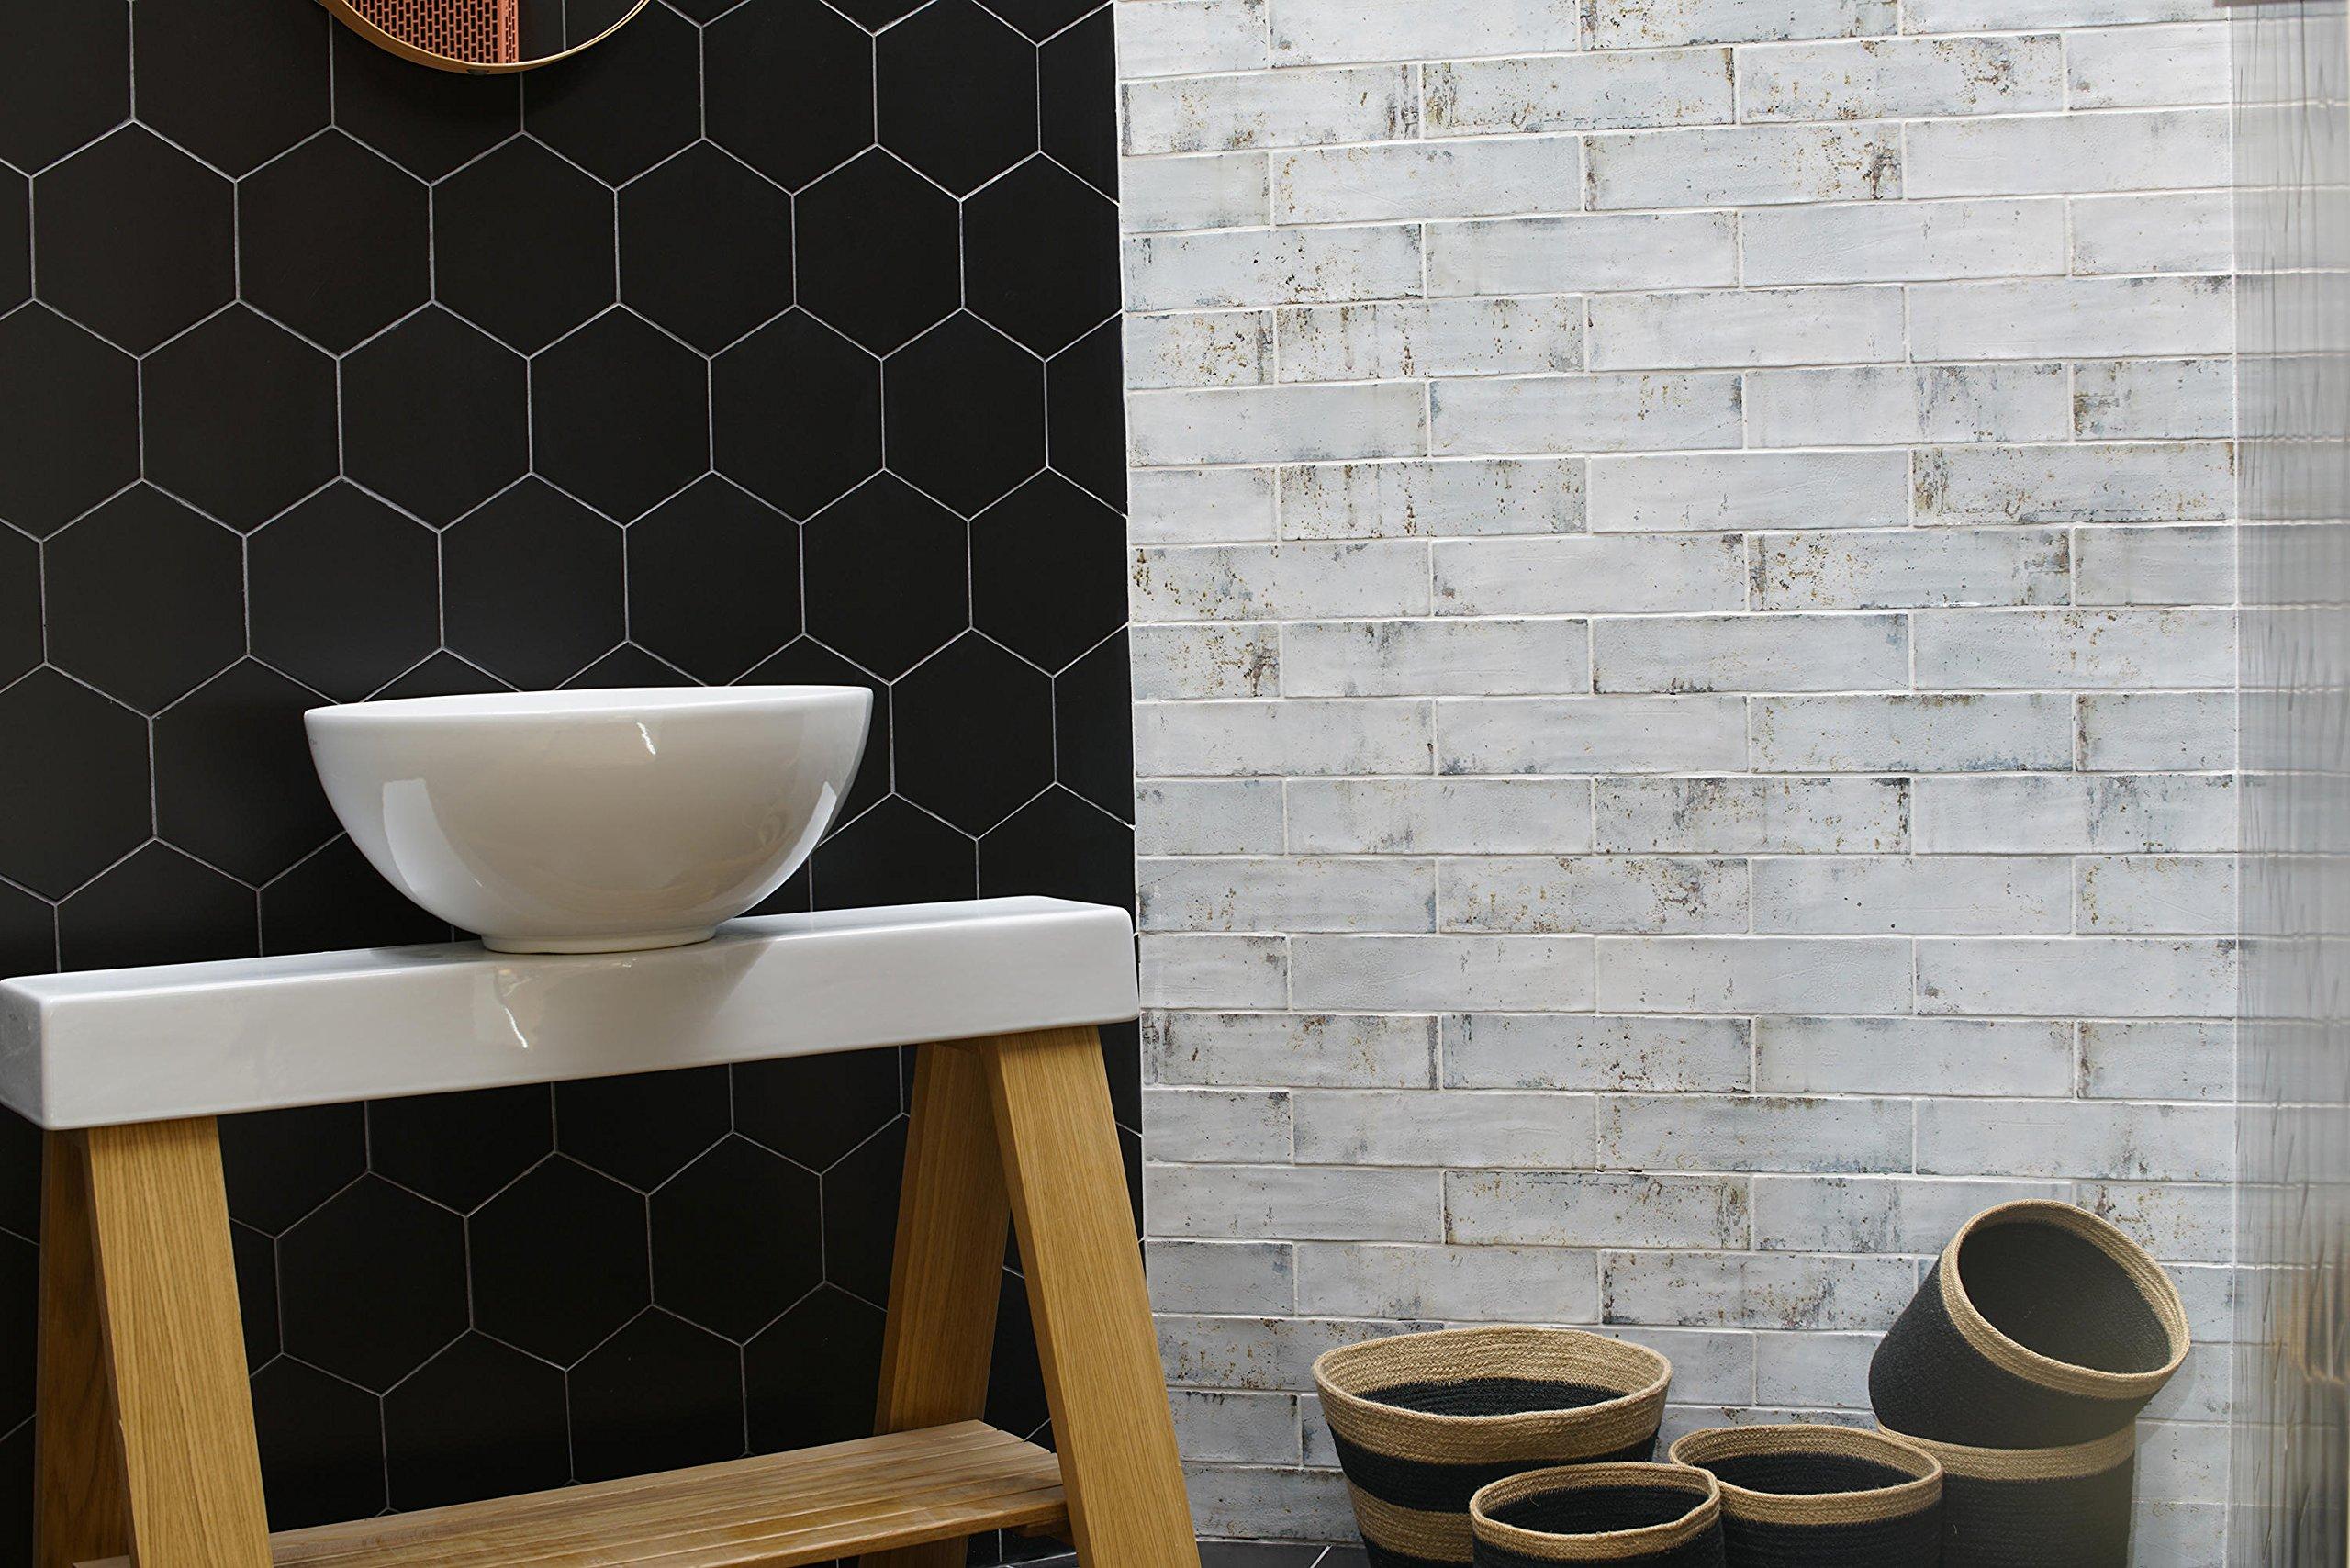 3x12 Palermo Collection Ocean Breeze White Glazed Ceramic Tile Backsplash Wall Bath 1SF (4 PIECES PER PACK)